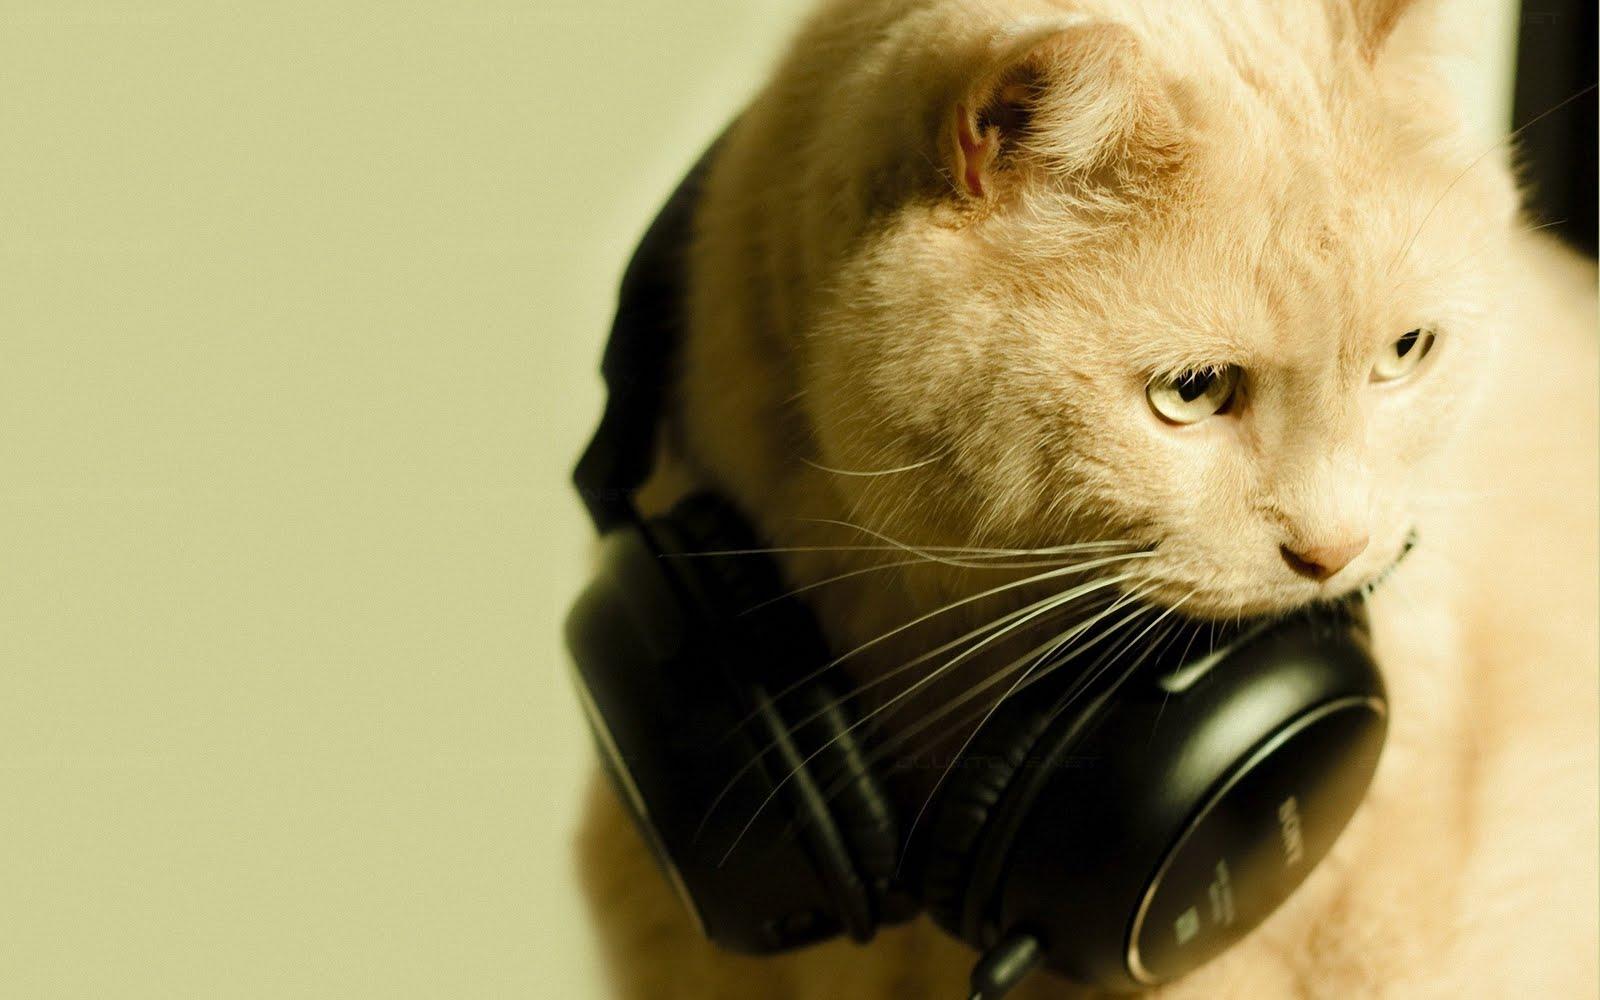 tips 6 - 8 Cara Mudah Memotret Kucing Agar Mendapatkan Hasil yang Sempurna